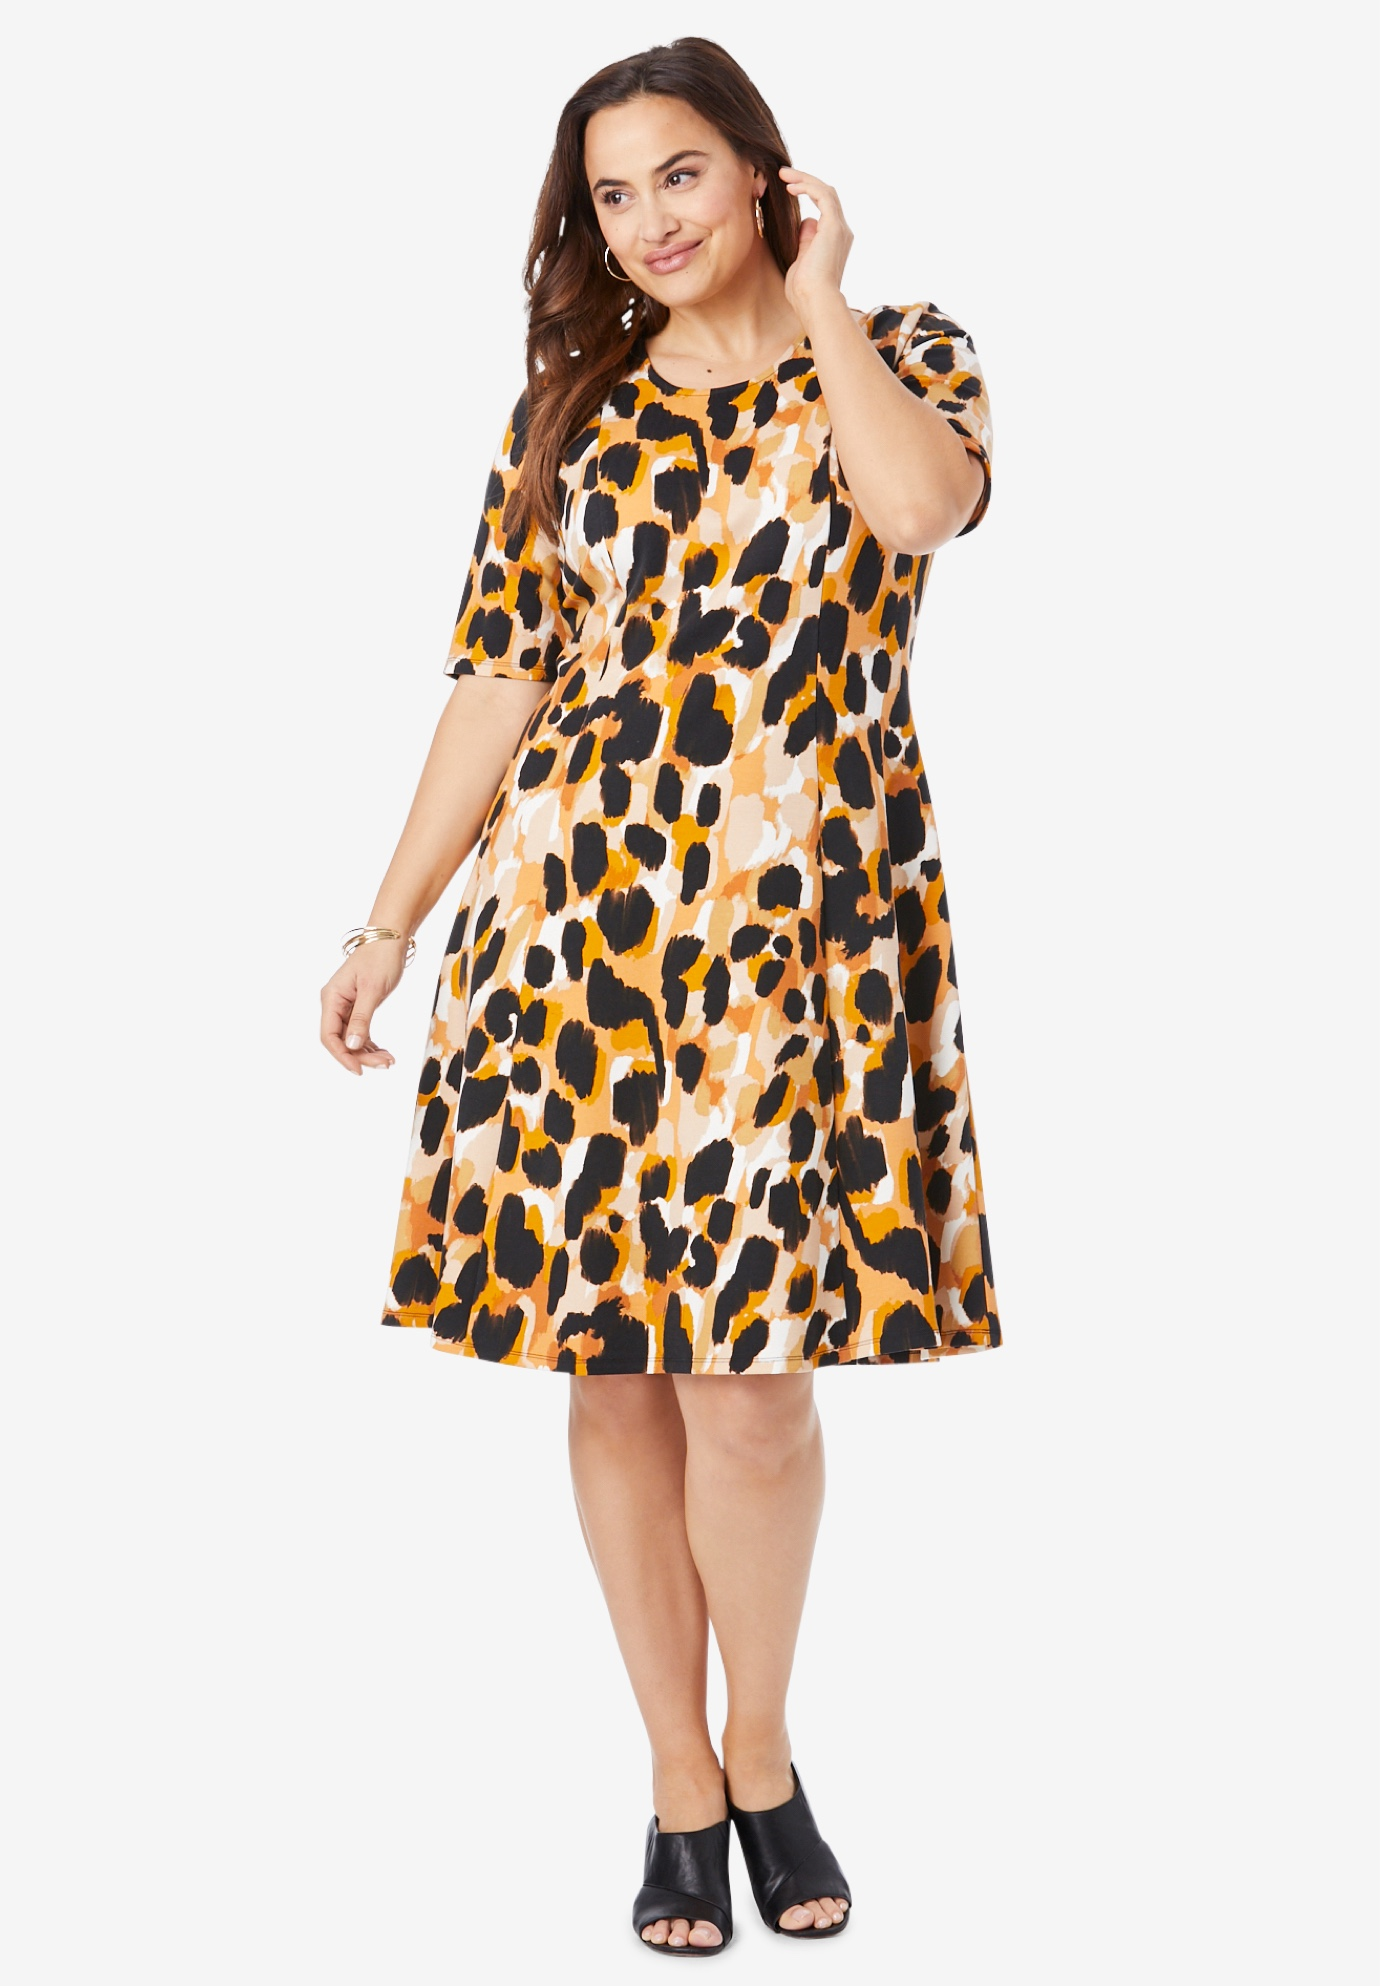 Ponté Knit Elbow Dress with Scoop Neckline